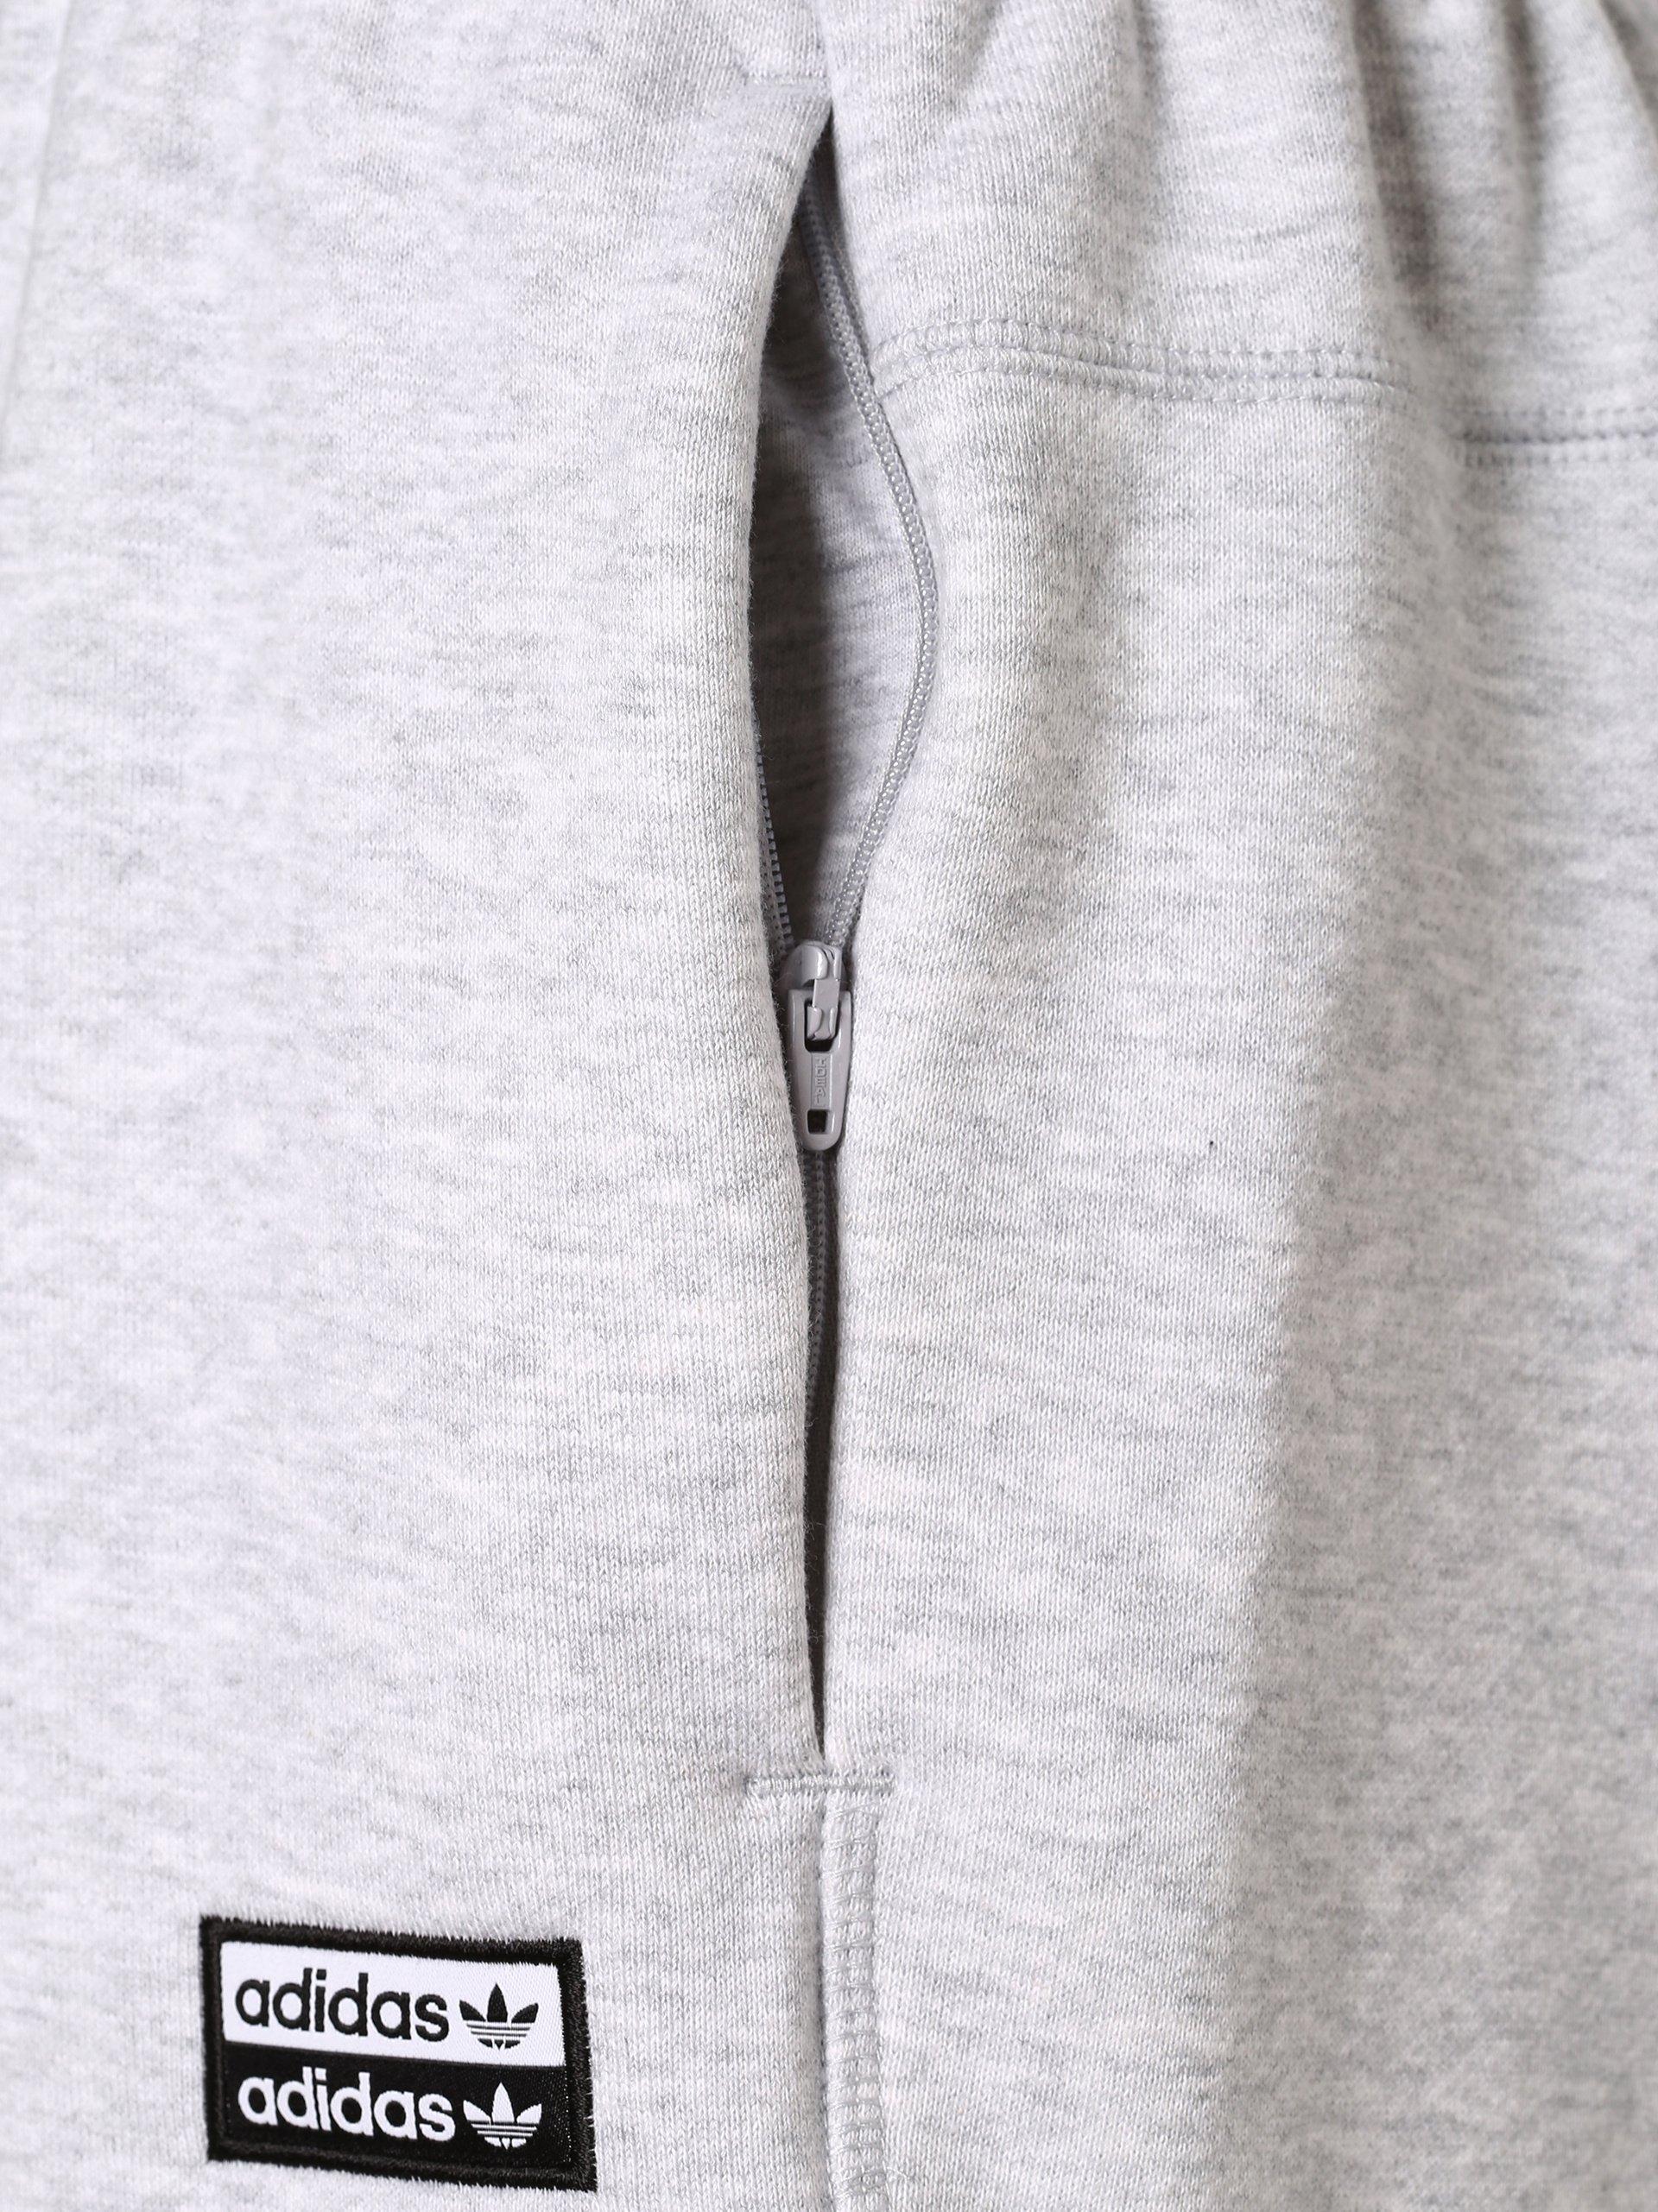 adidas Originals Herren Shorts